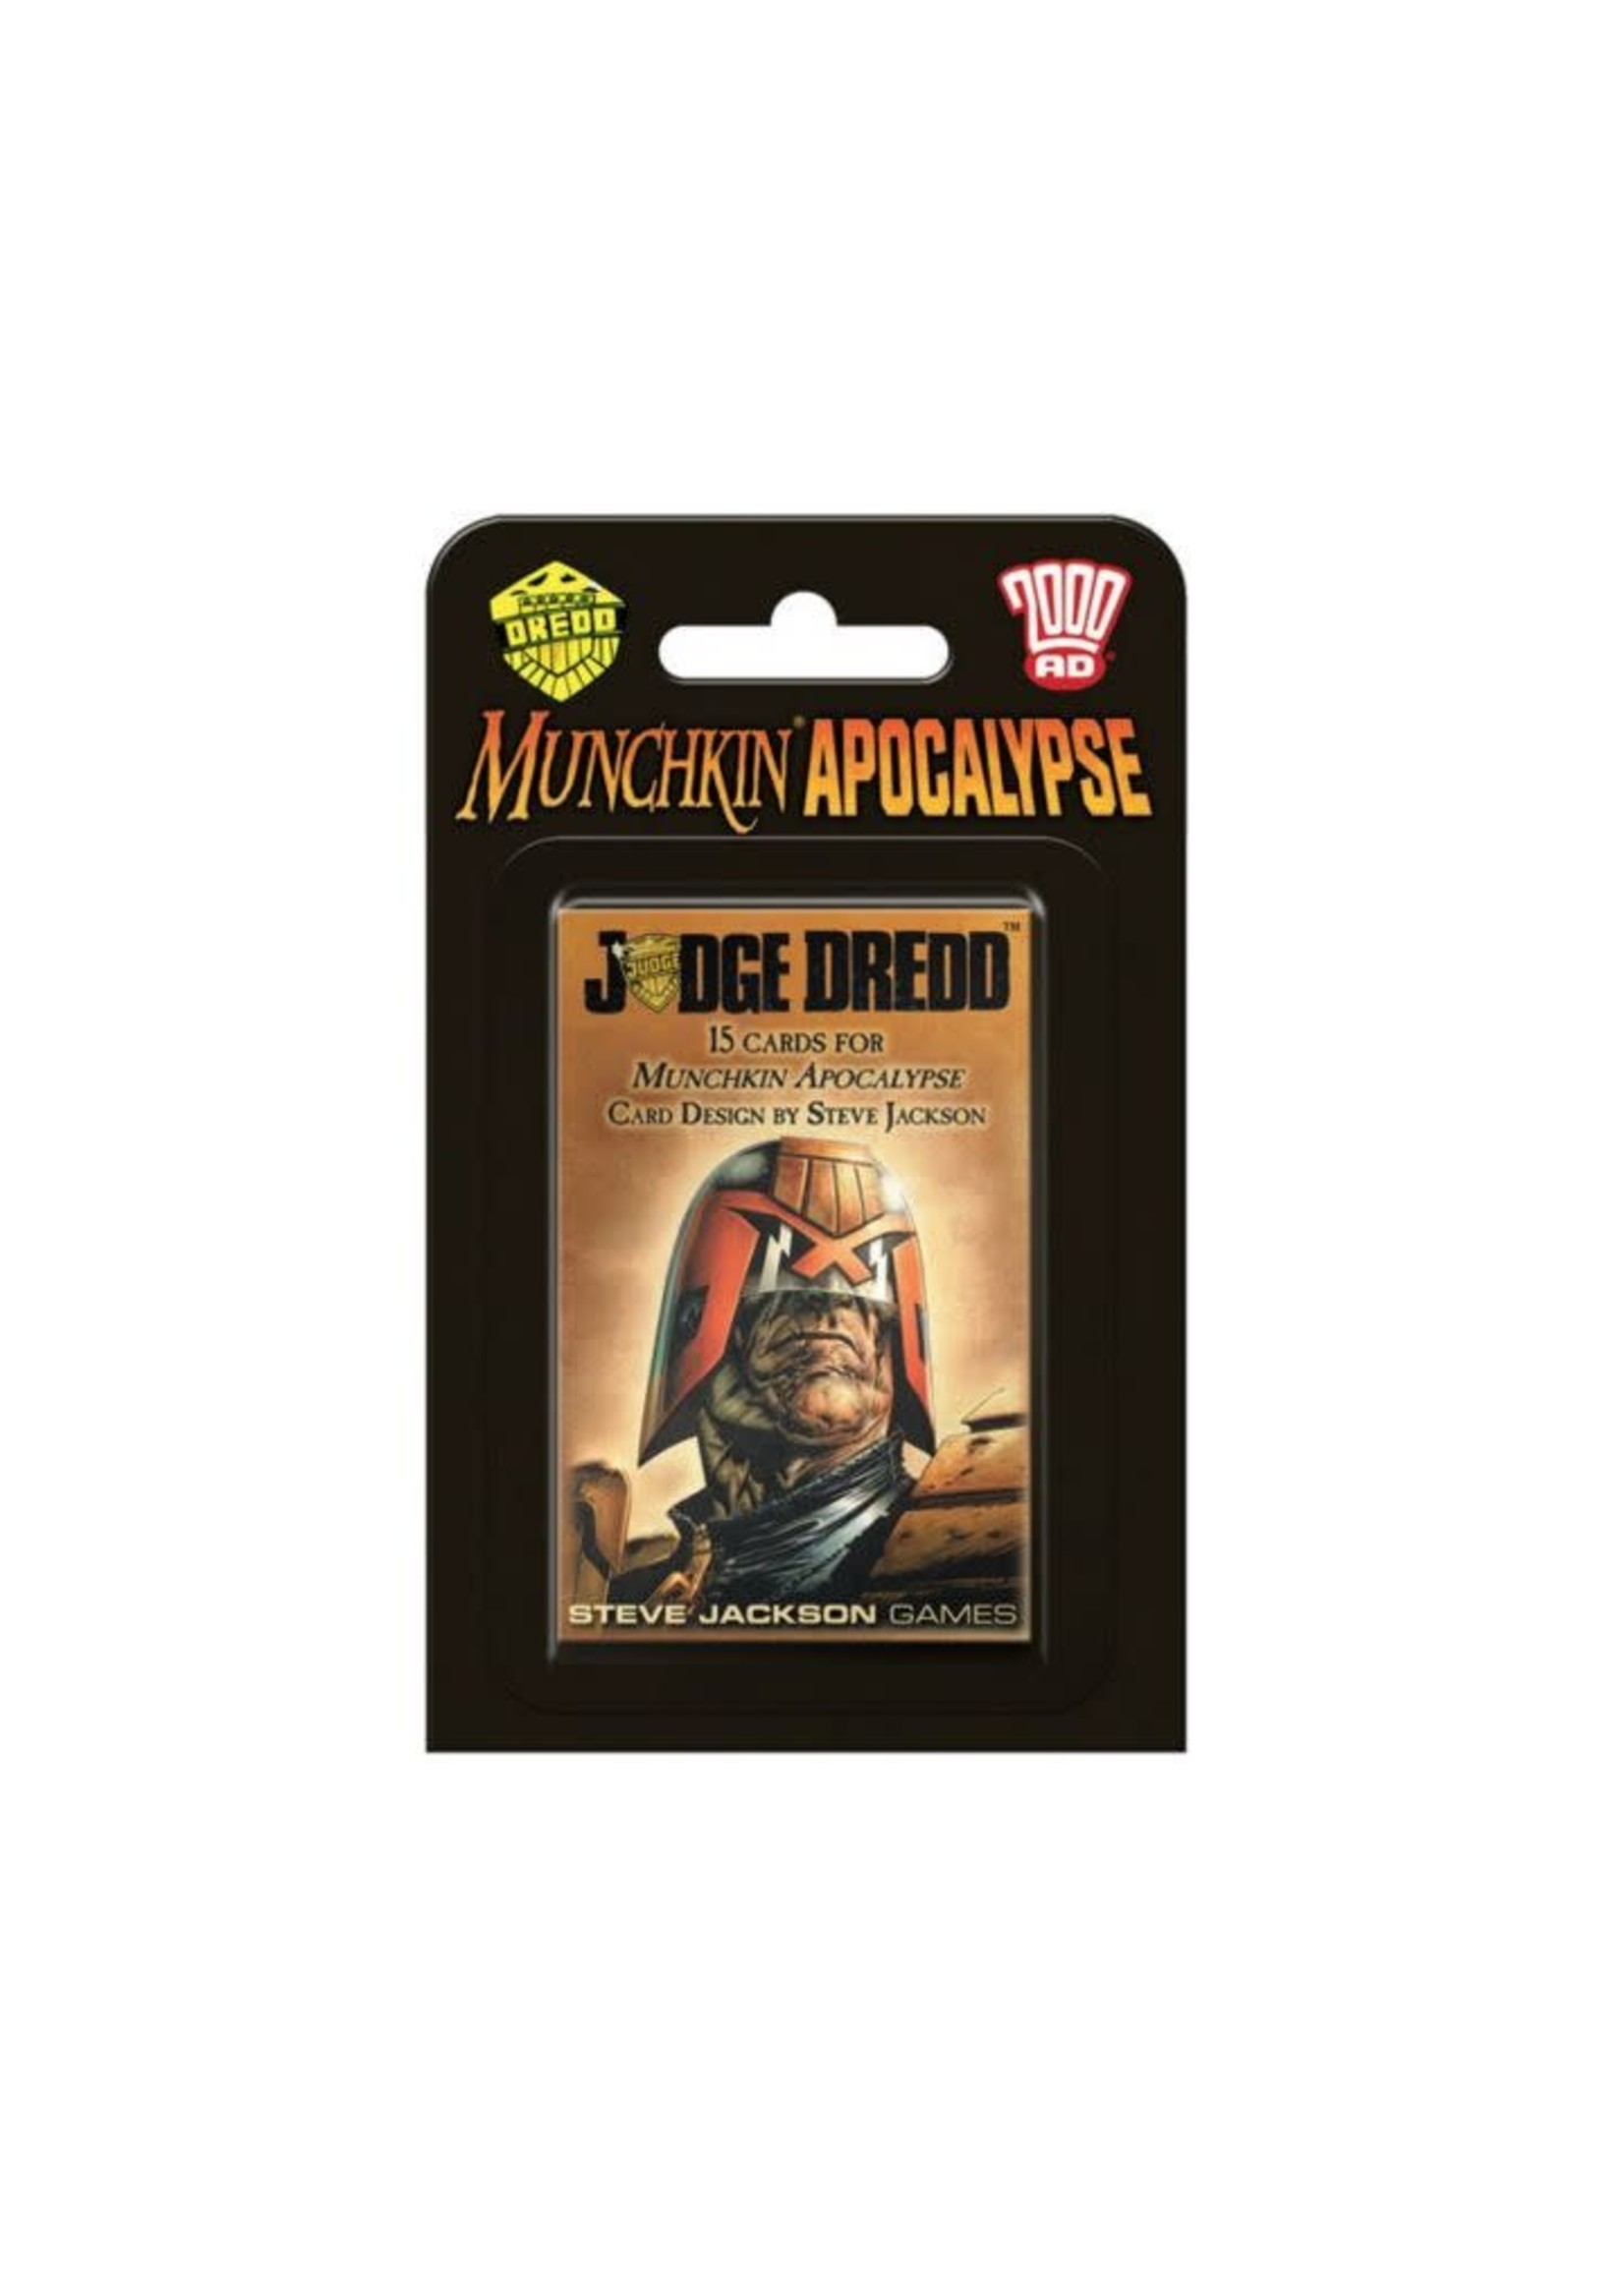 Munchkin Apocalypse Judge Dredd